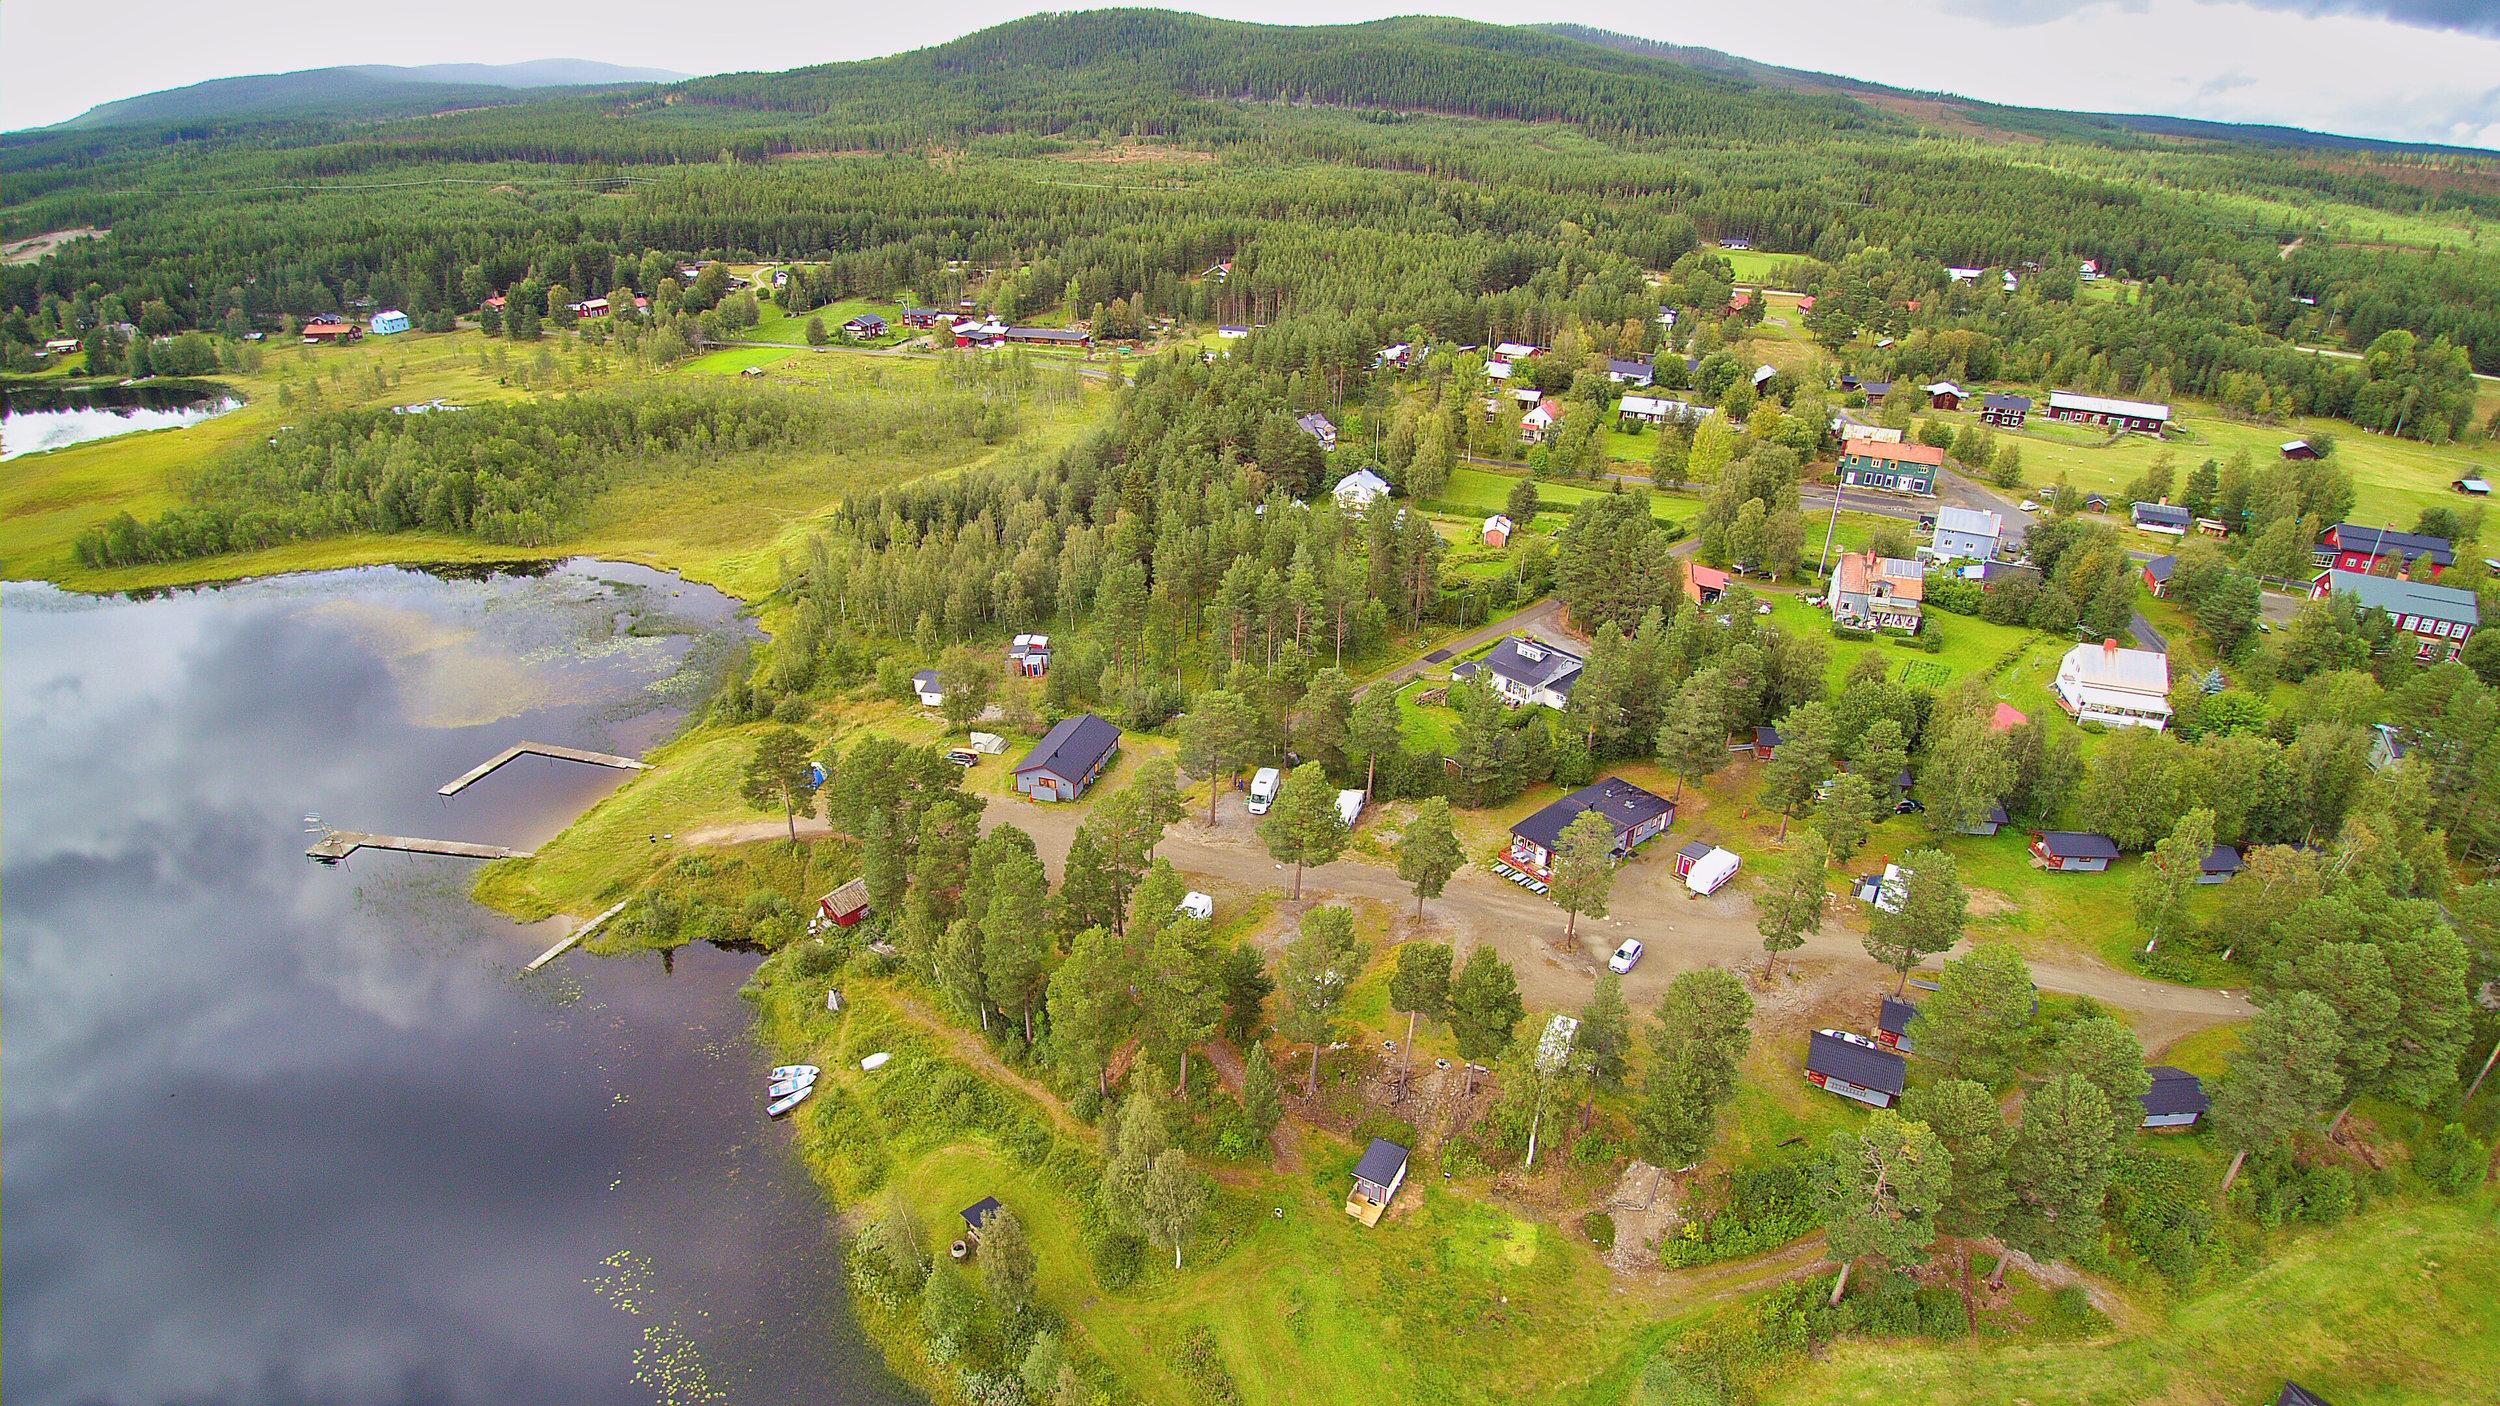 Flygfoto Sonfjällcampen 2016-08-09 (5).jpeg